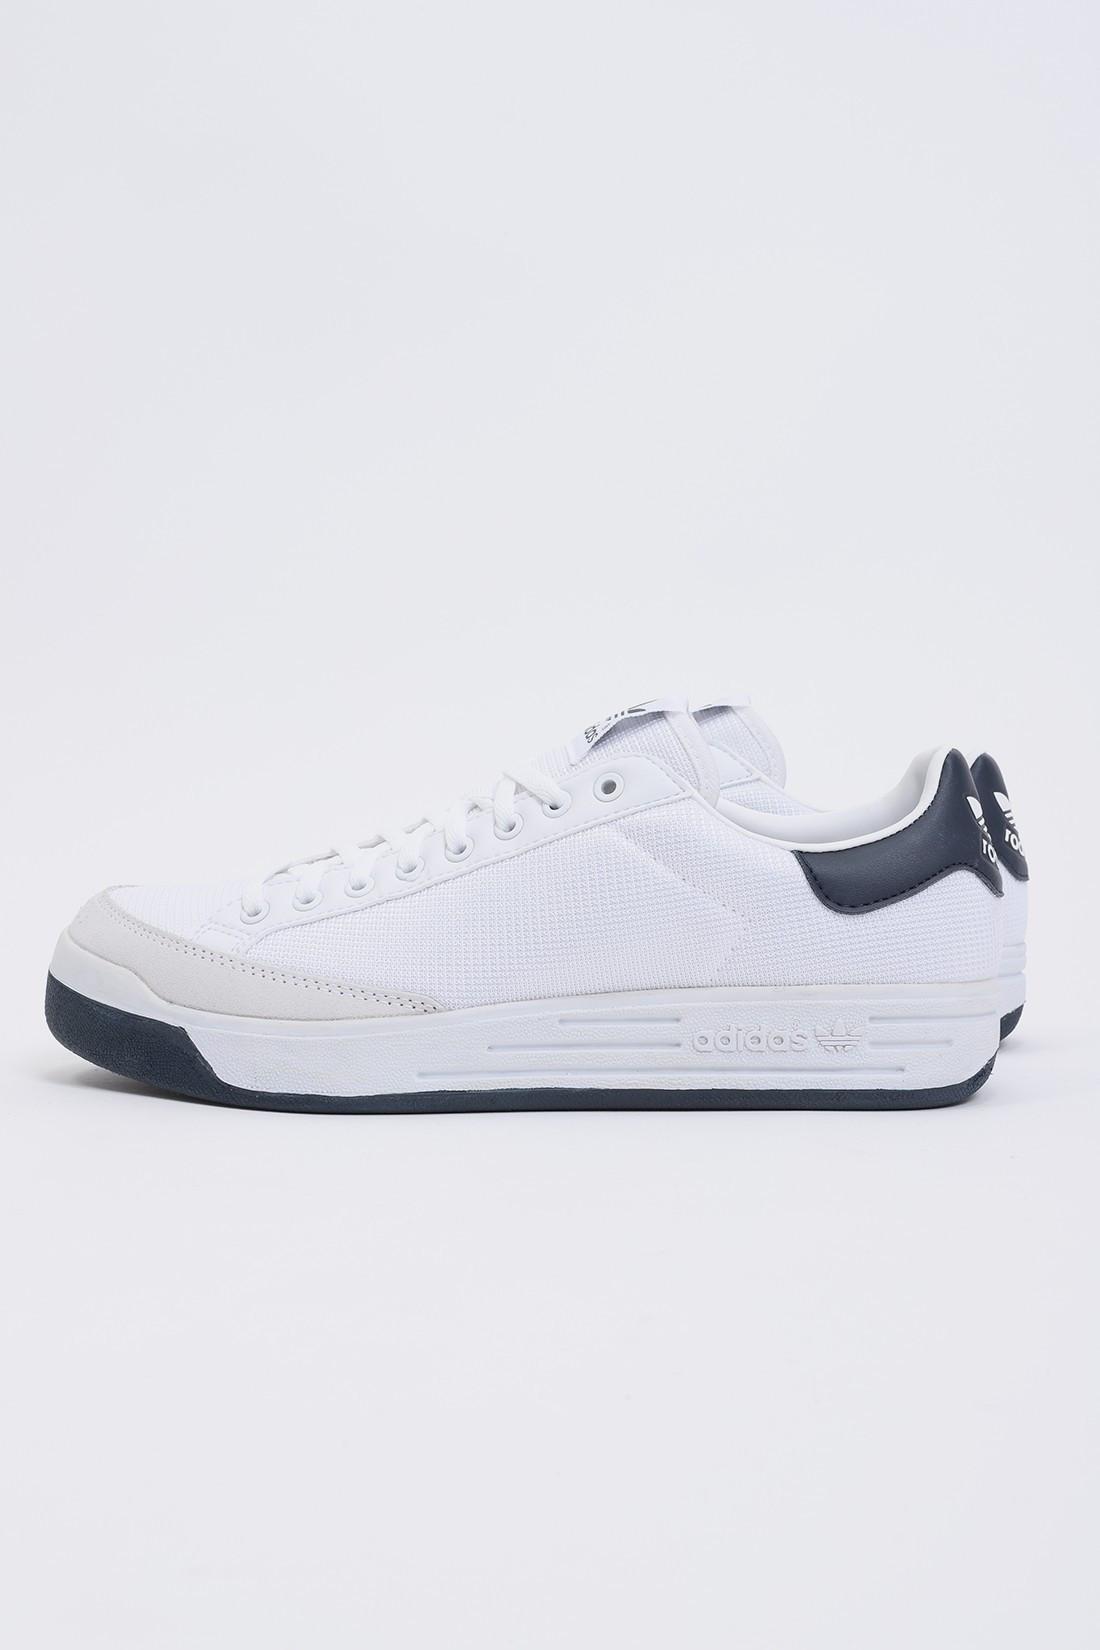 ADIDAS / Rod laver g99864 White / navy